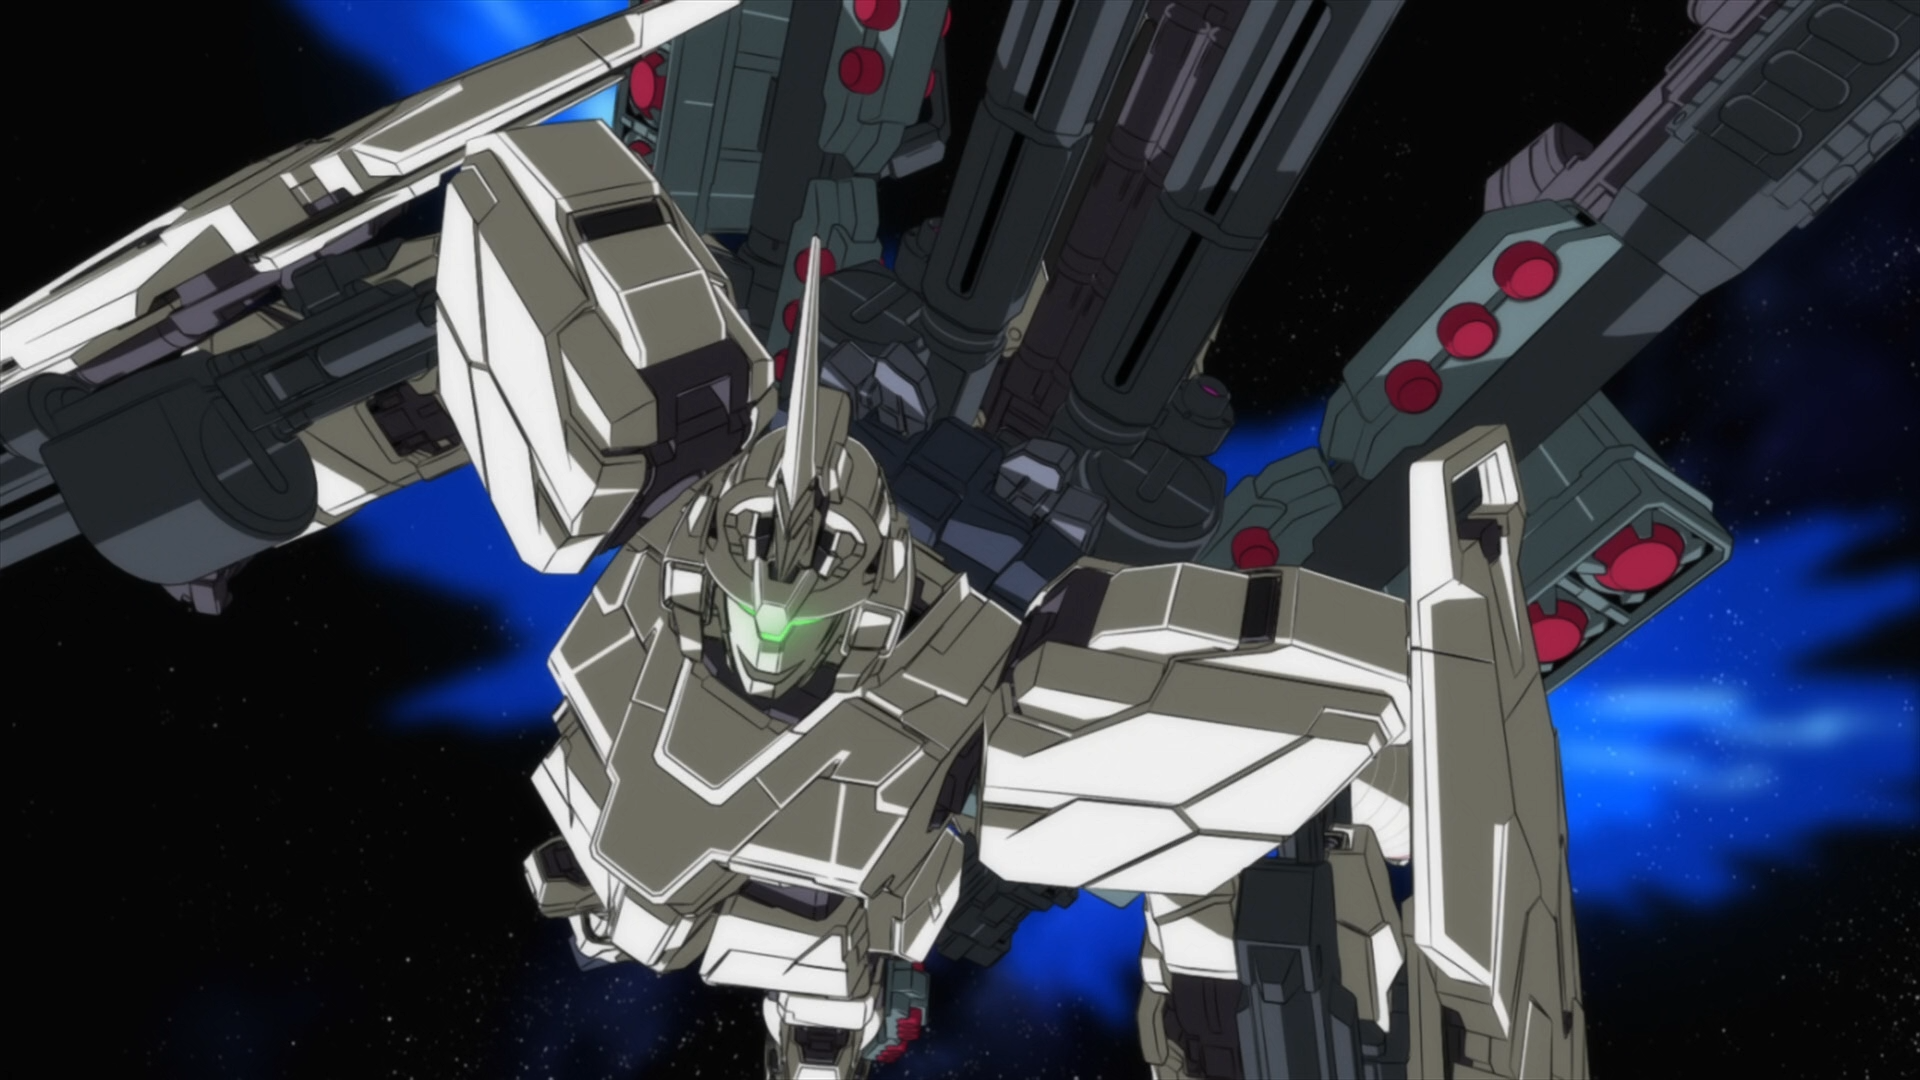 Gundam Unicorn 62 Anime Background - Animewp.com